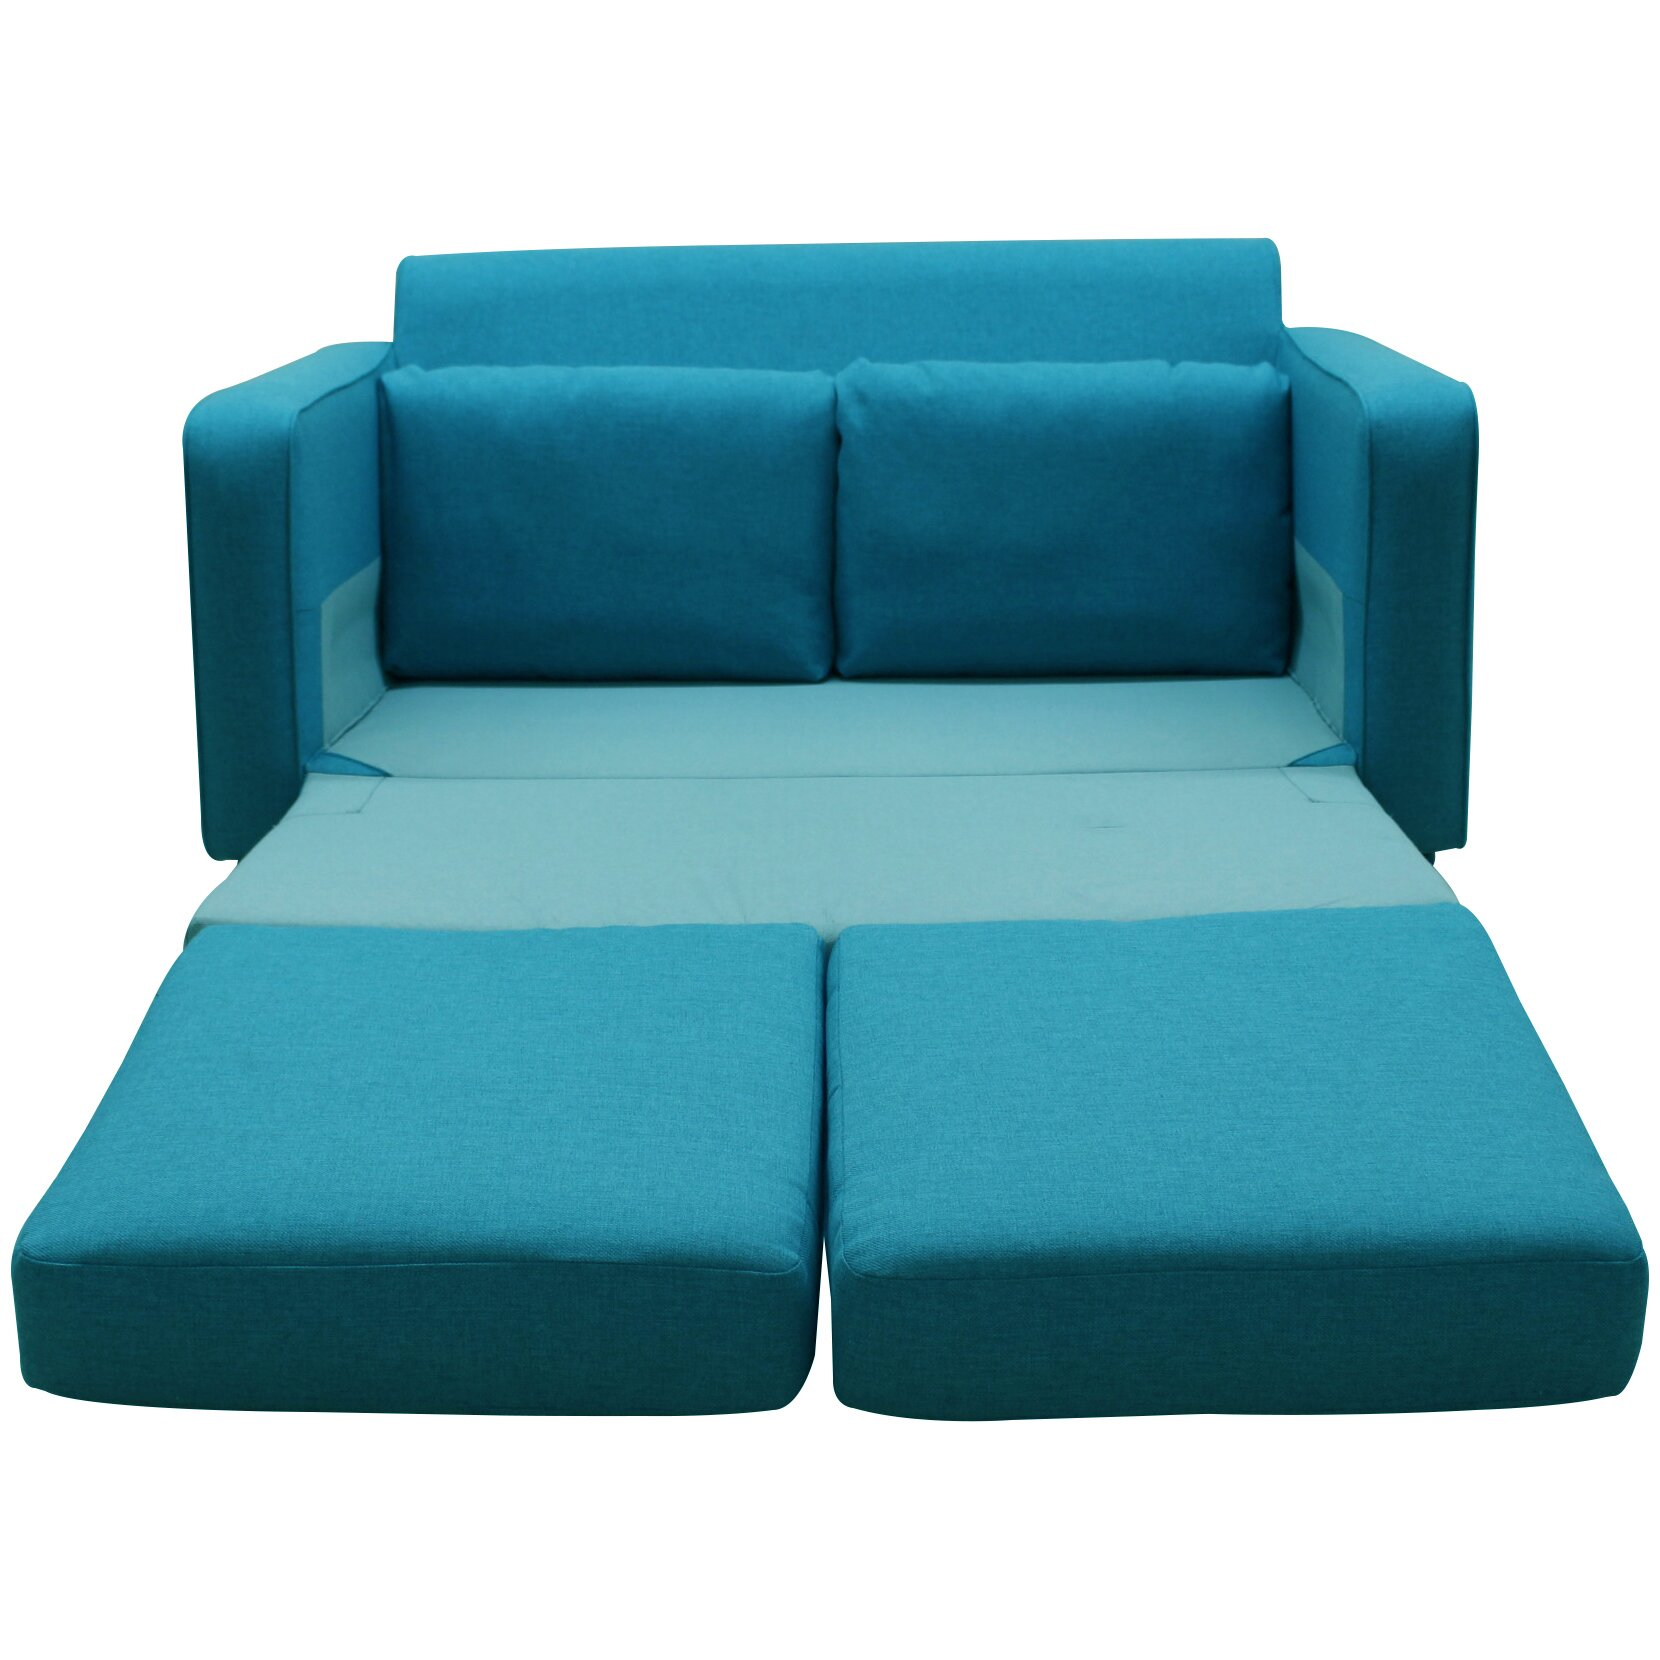 Lightweight Sofa Sleeper Futon Most Comfortable Sleeper